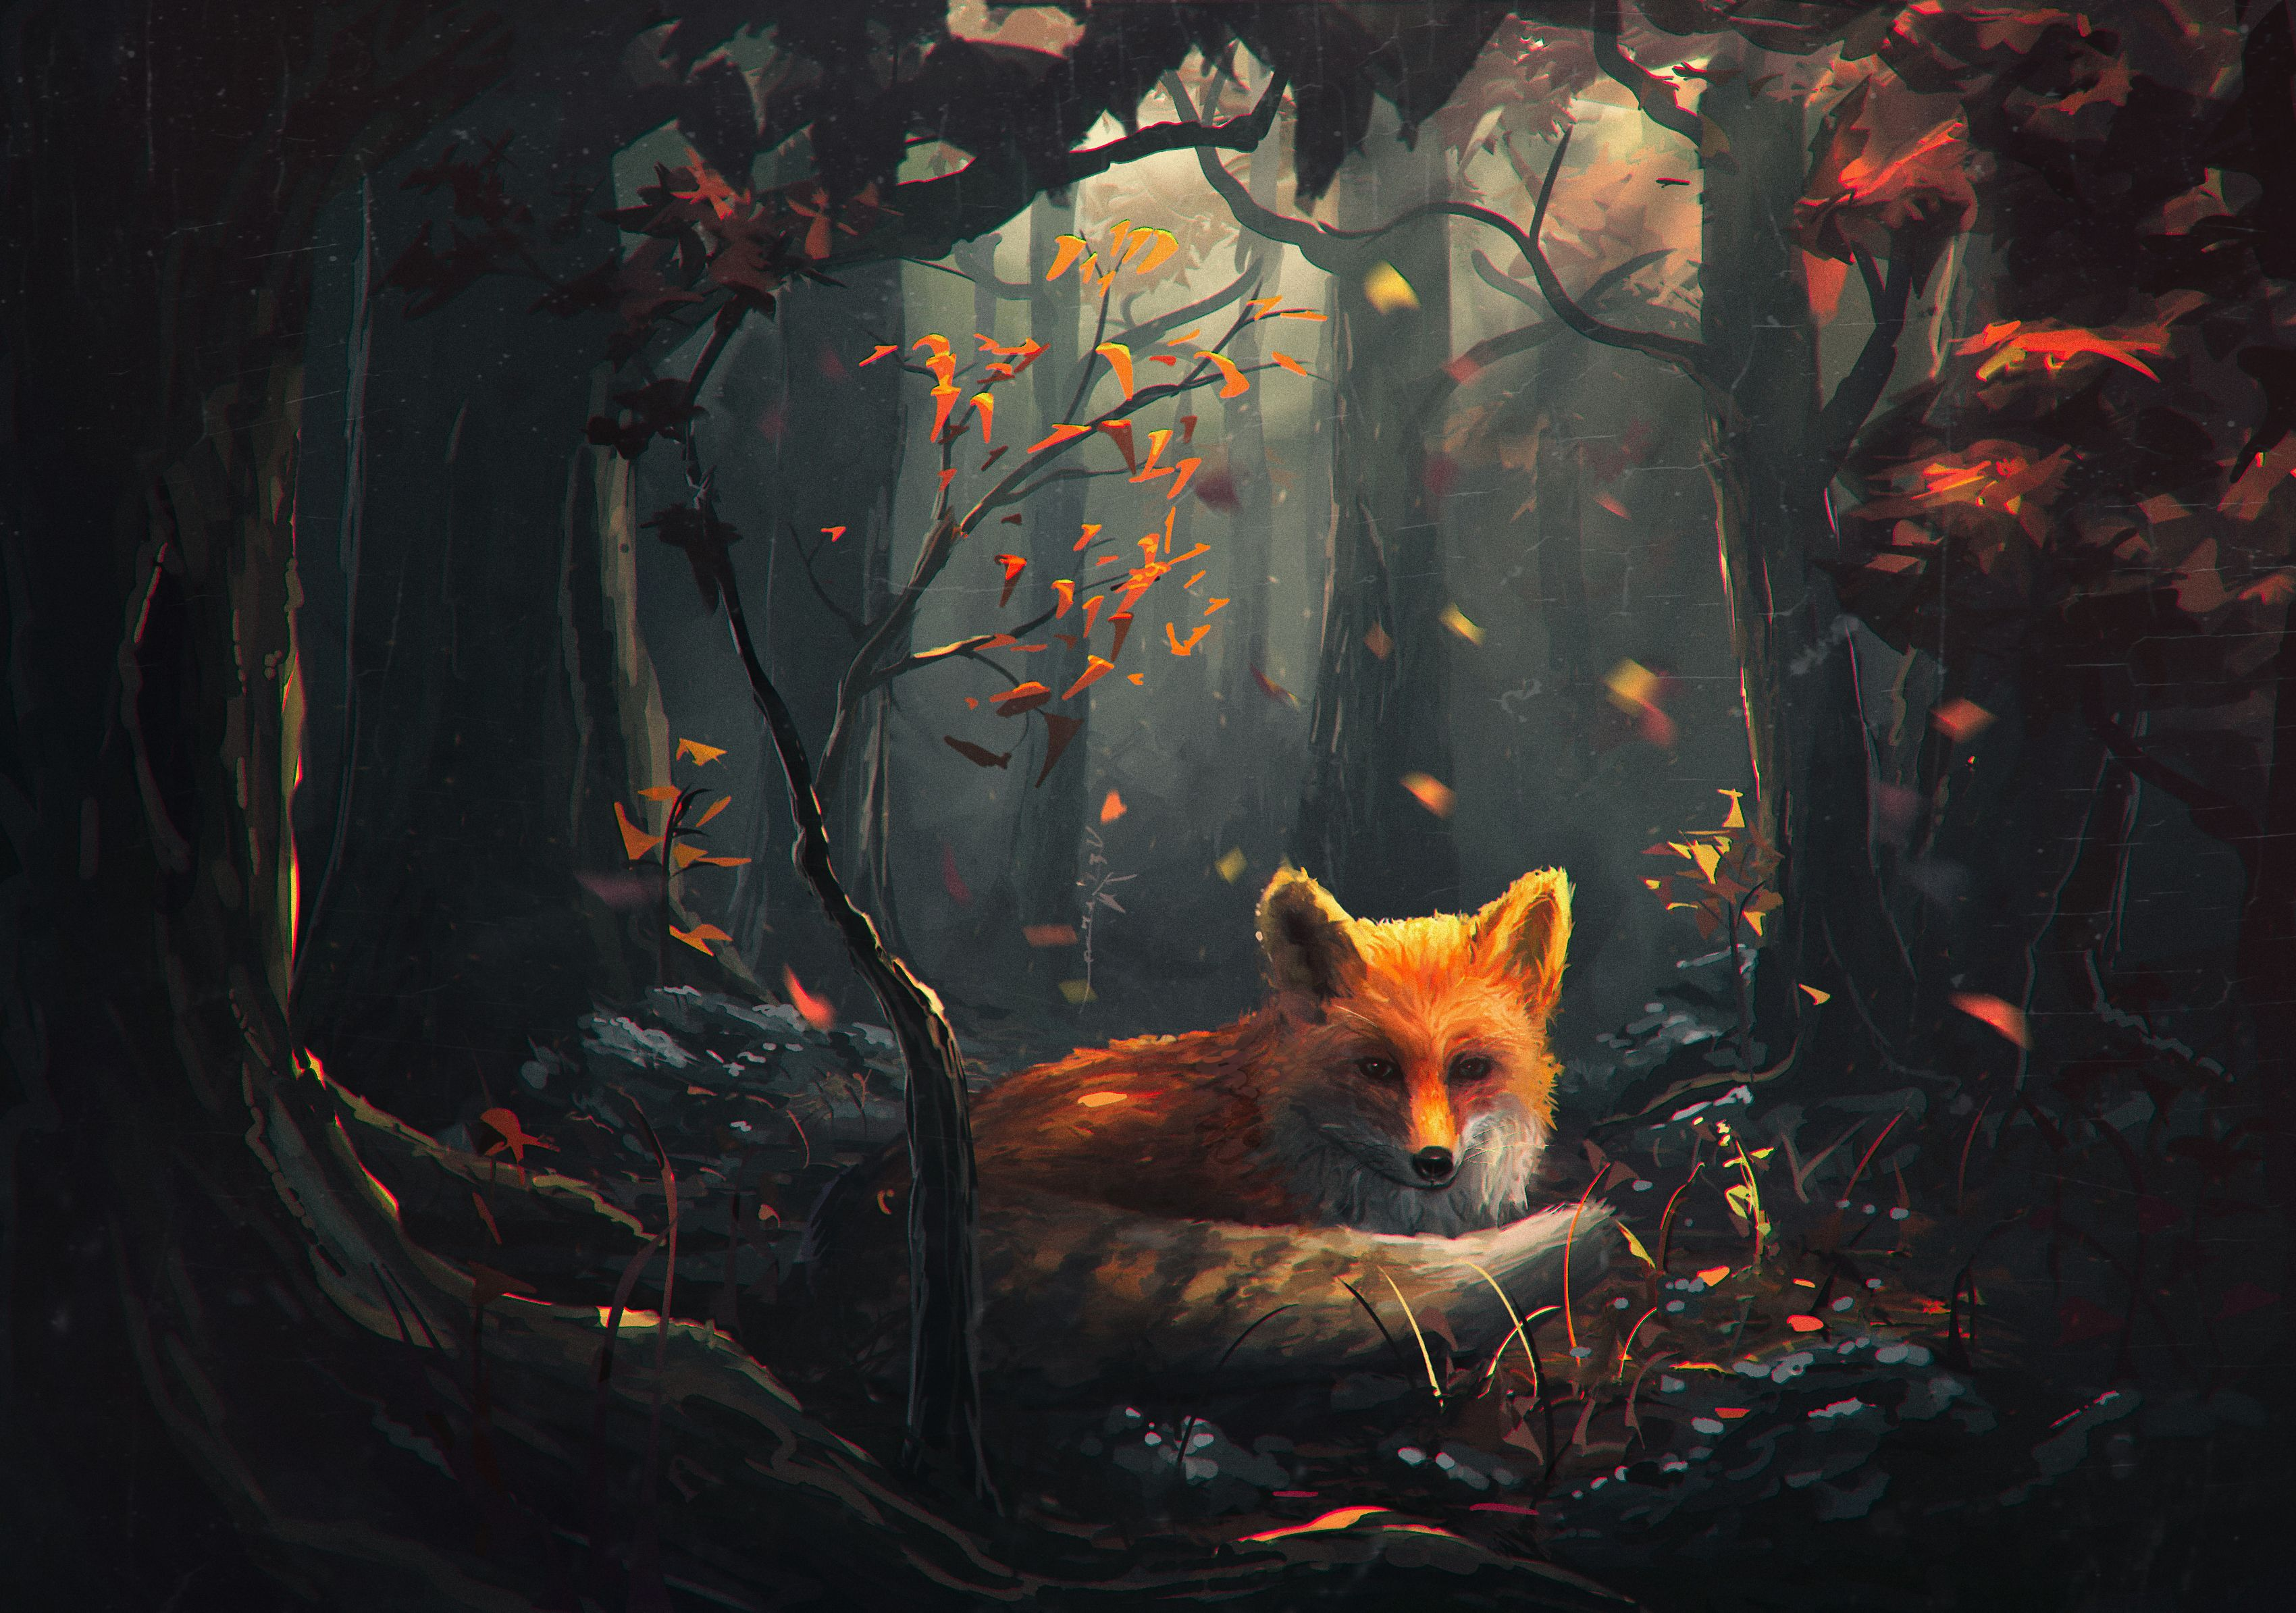 Black Fox Wallpapers Top Free Black Fox Backgrounds Wallpaperaccess